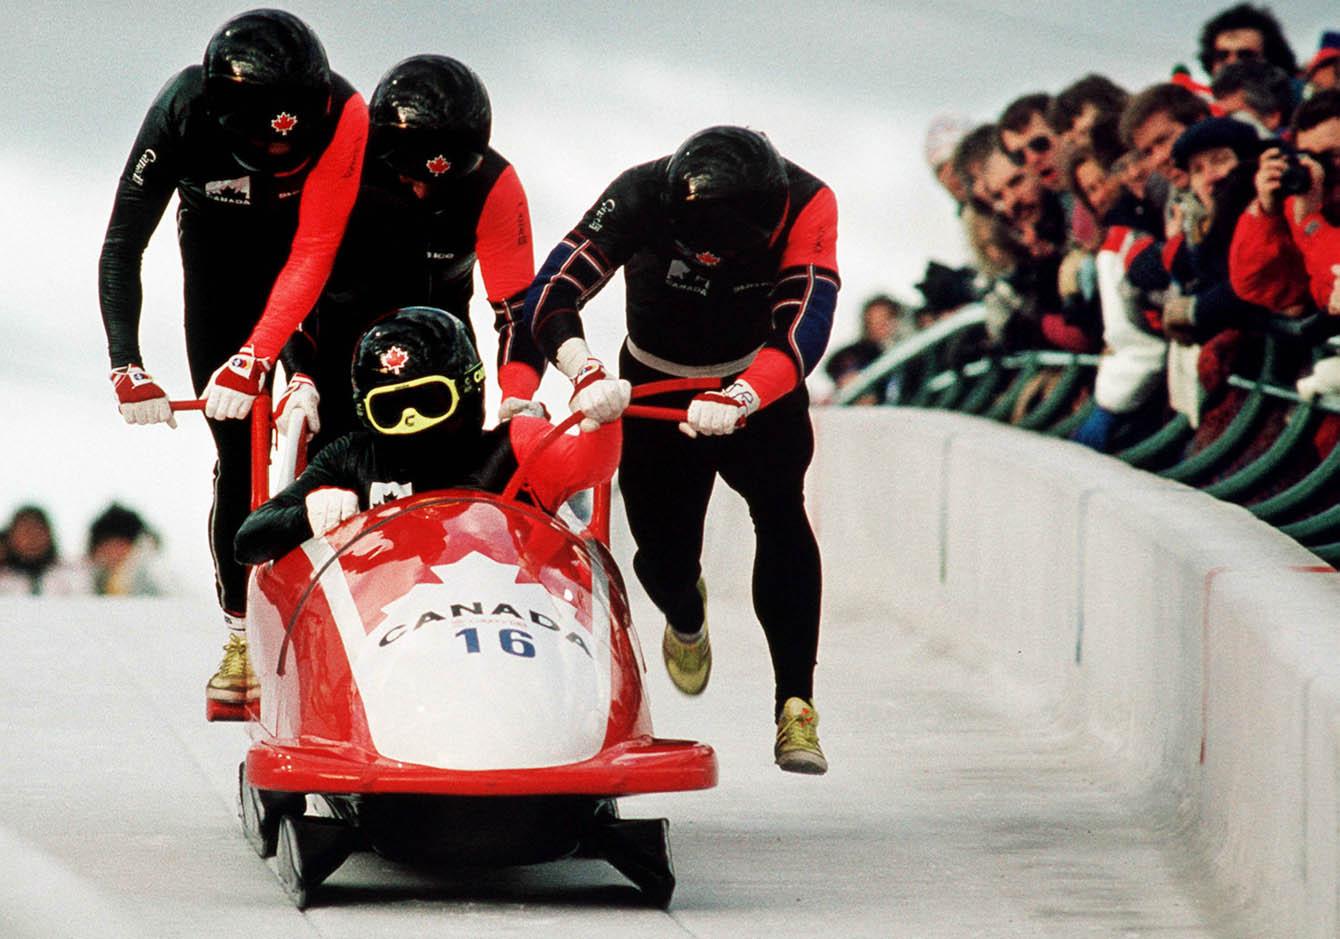 Four men running with bobsleigh